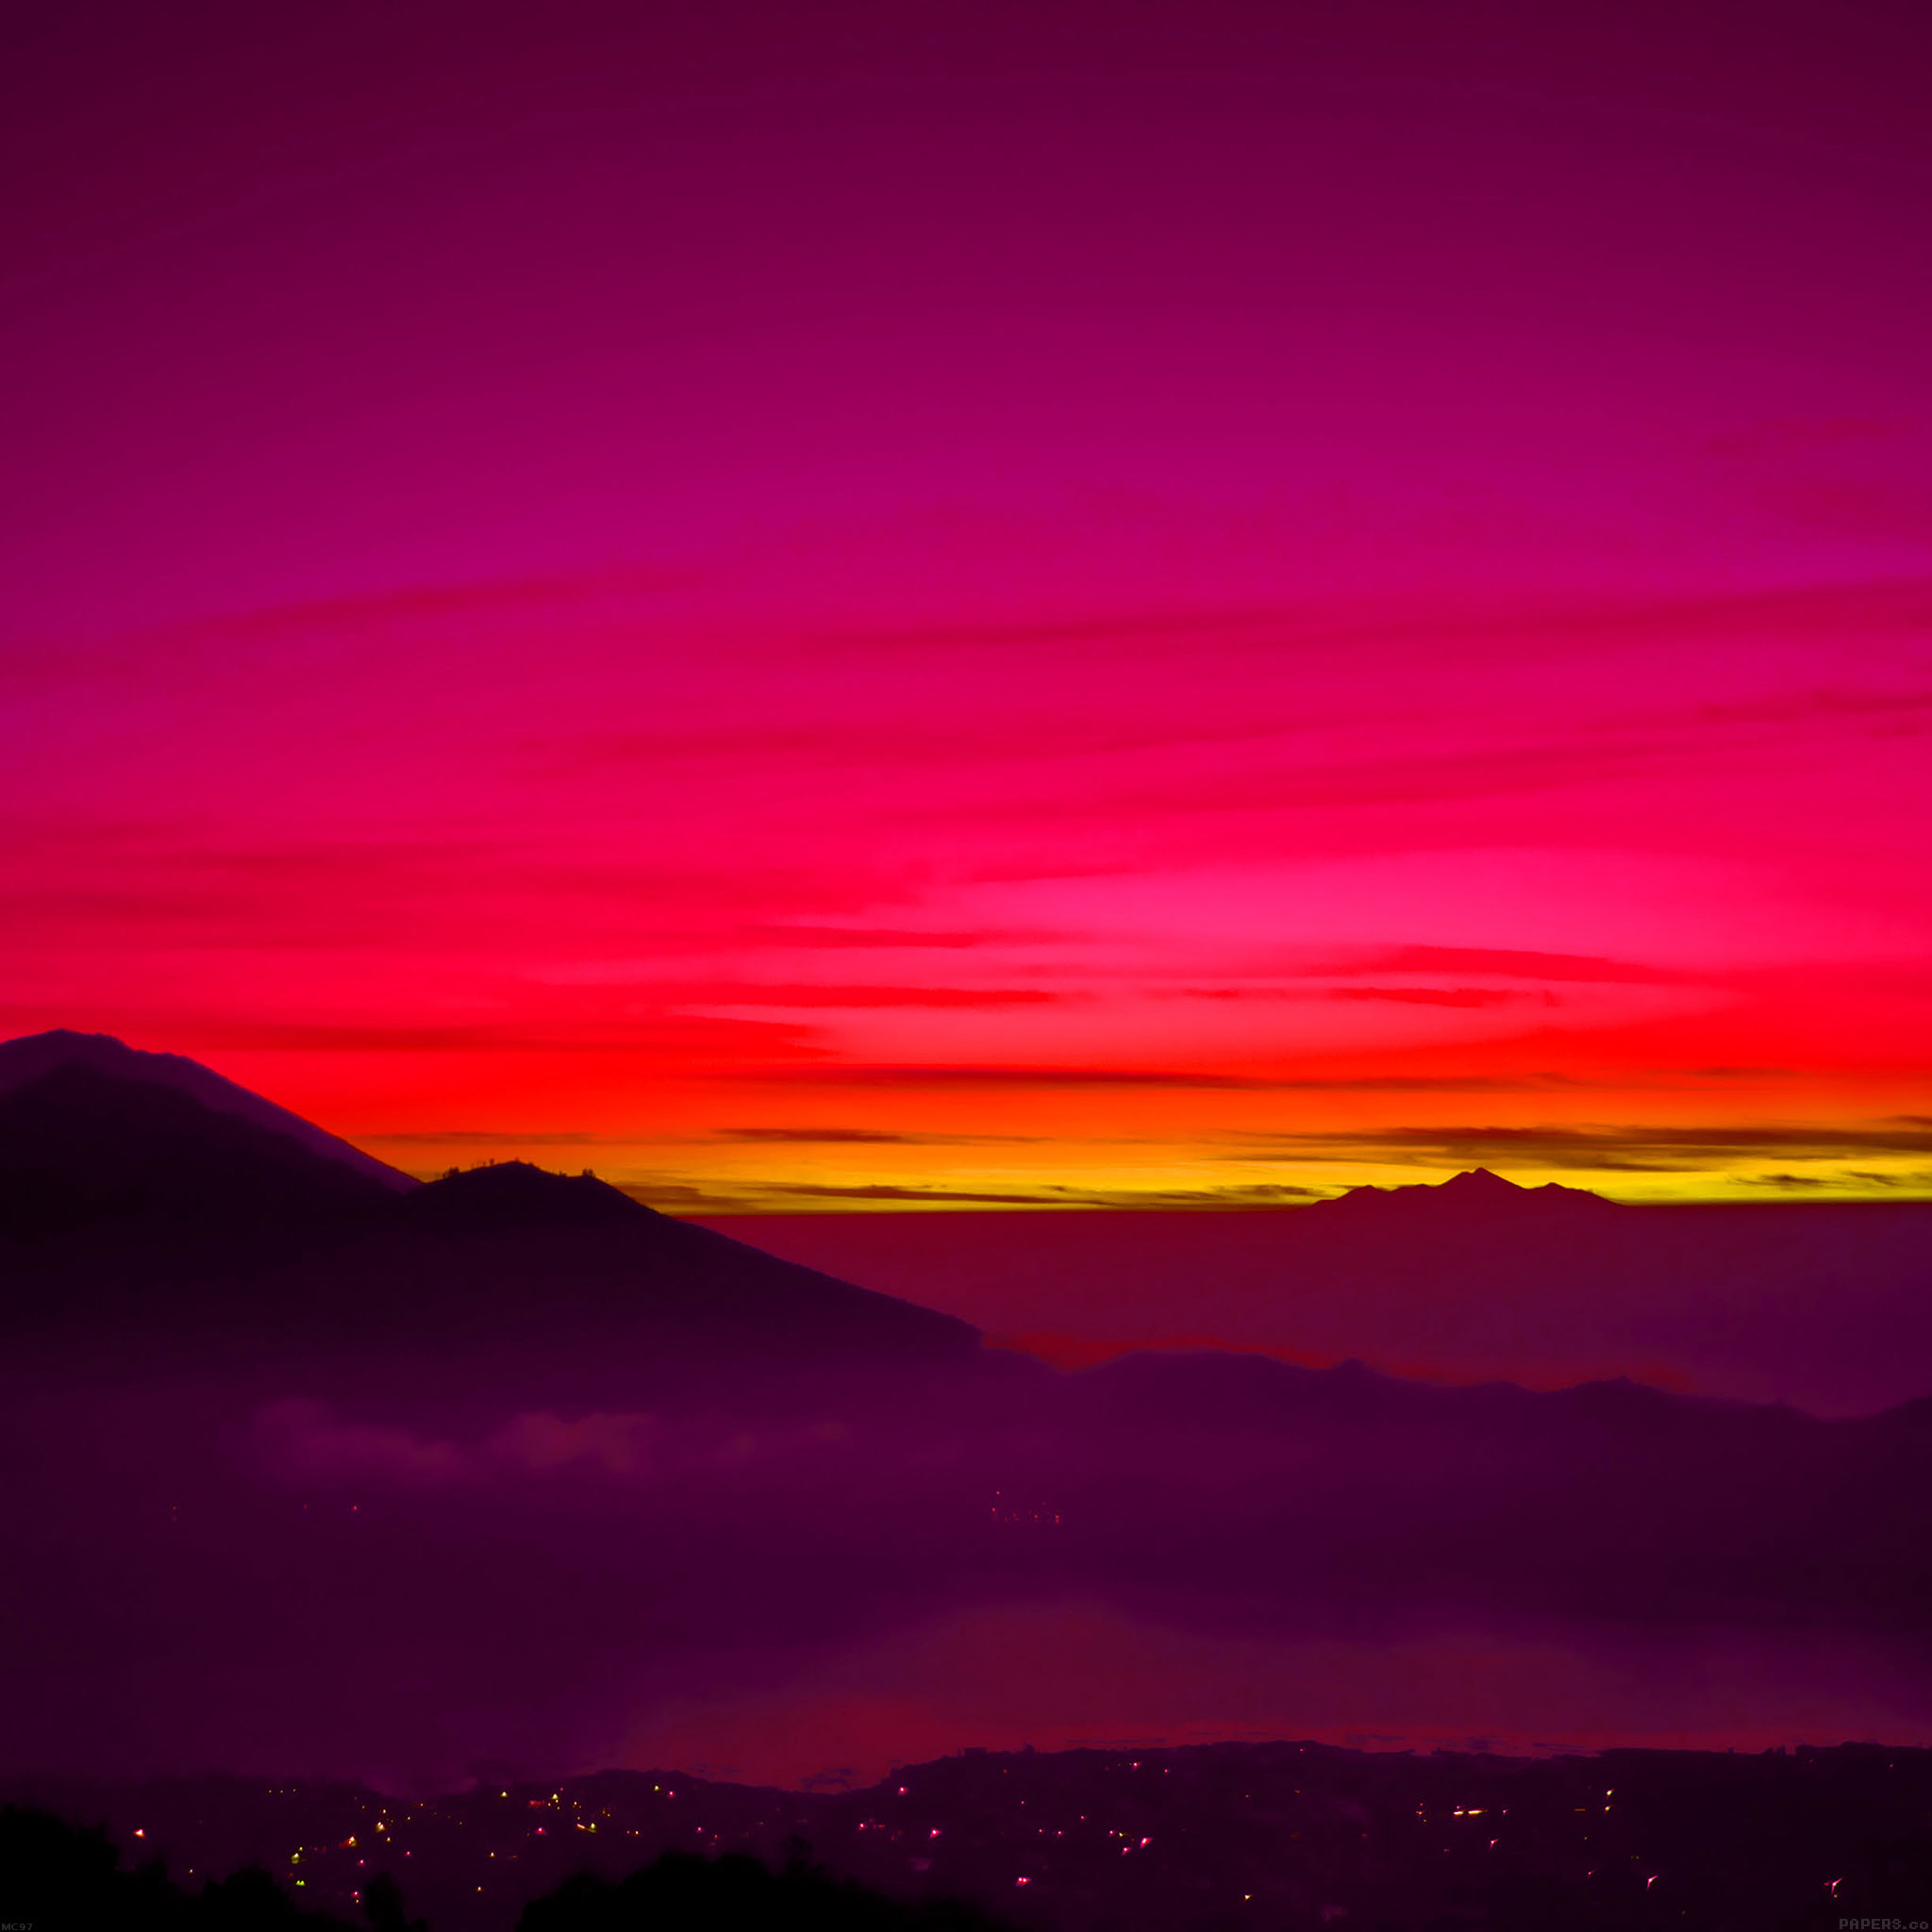 Desktop Sports Car Wallpapers Mc97 Wallpaper Red Balinese Dream Sea Mountain Sunset